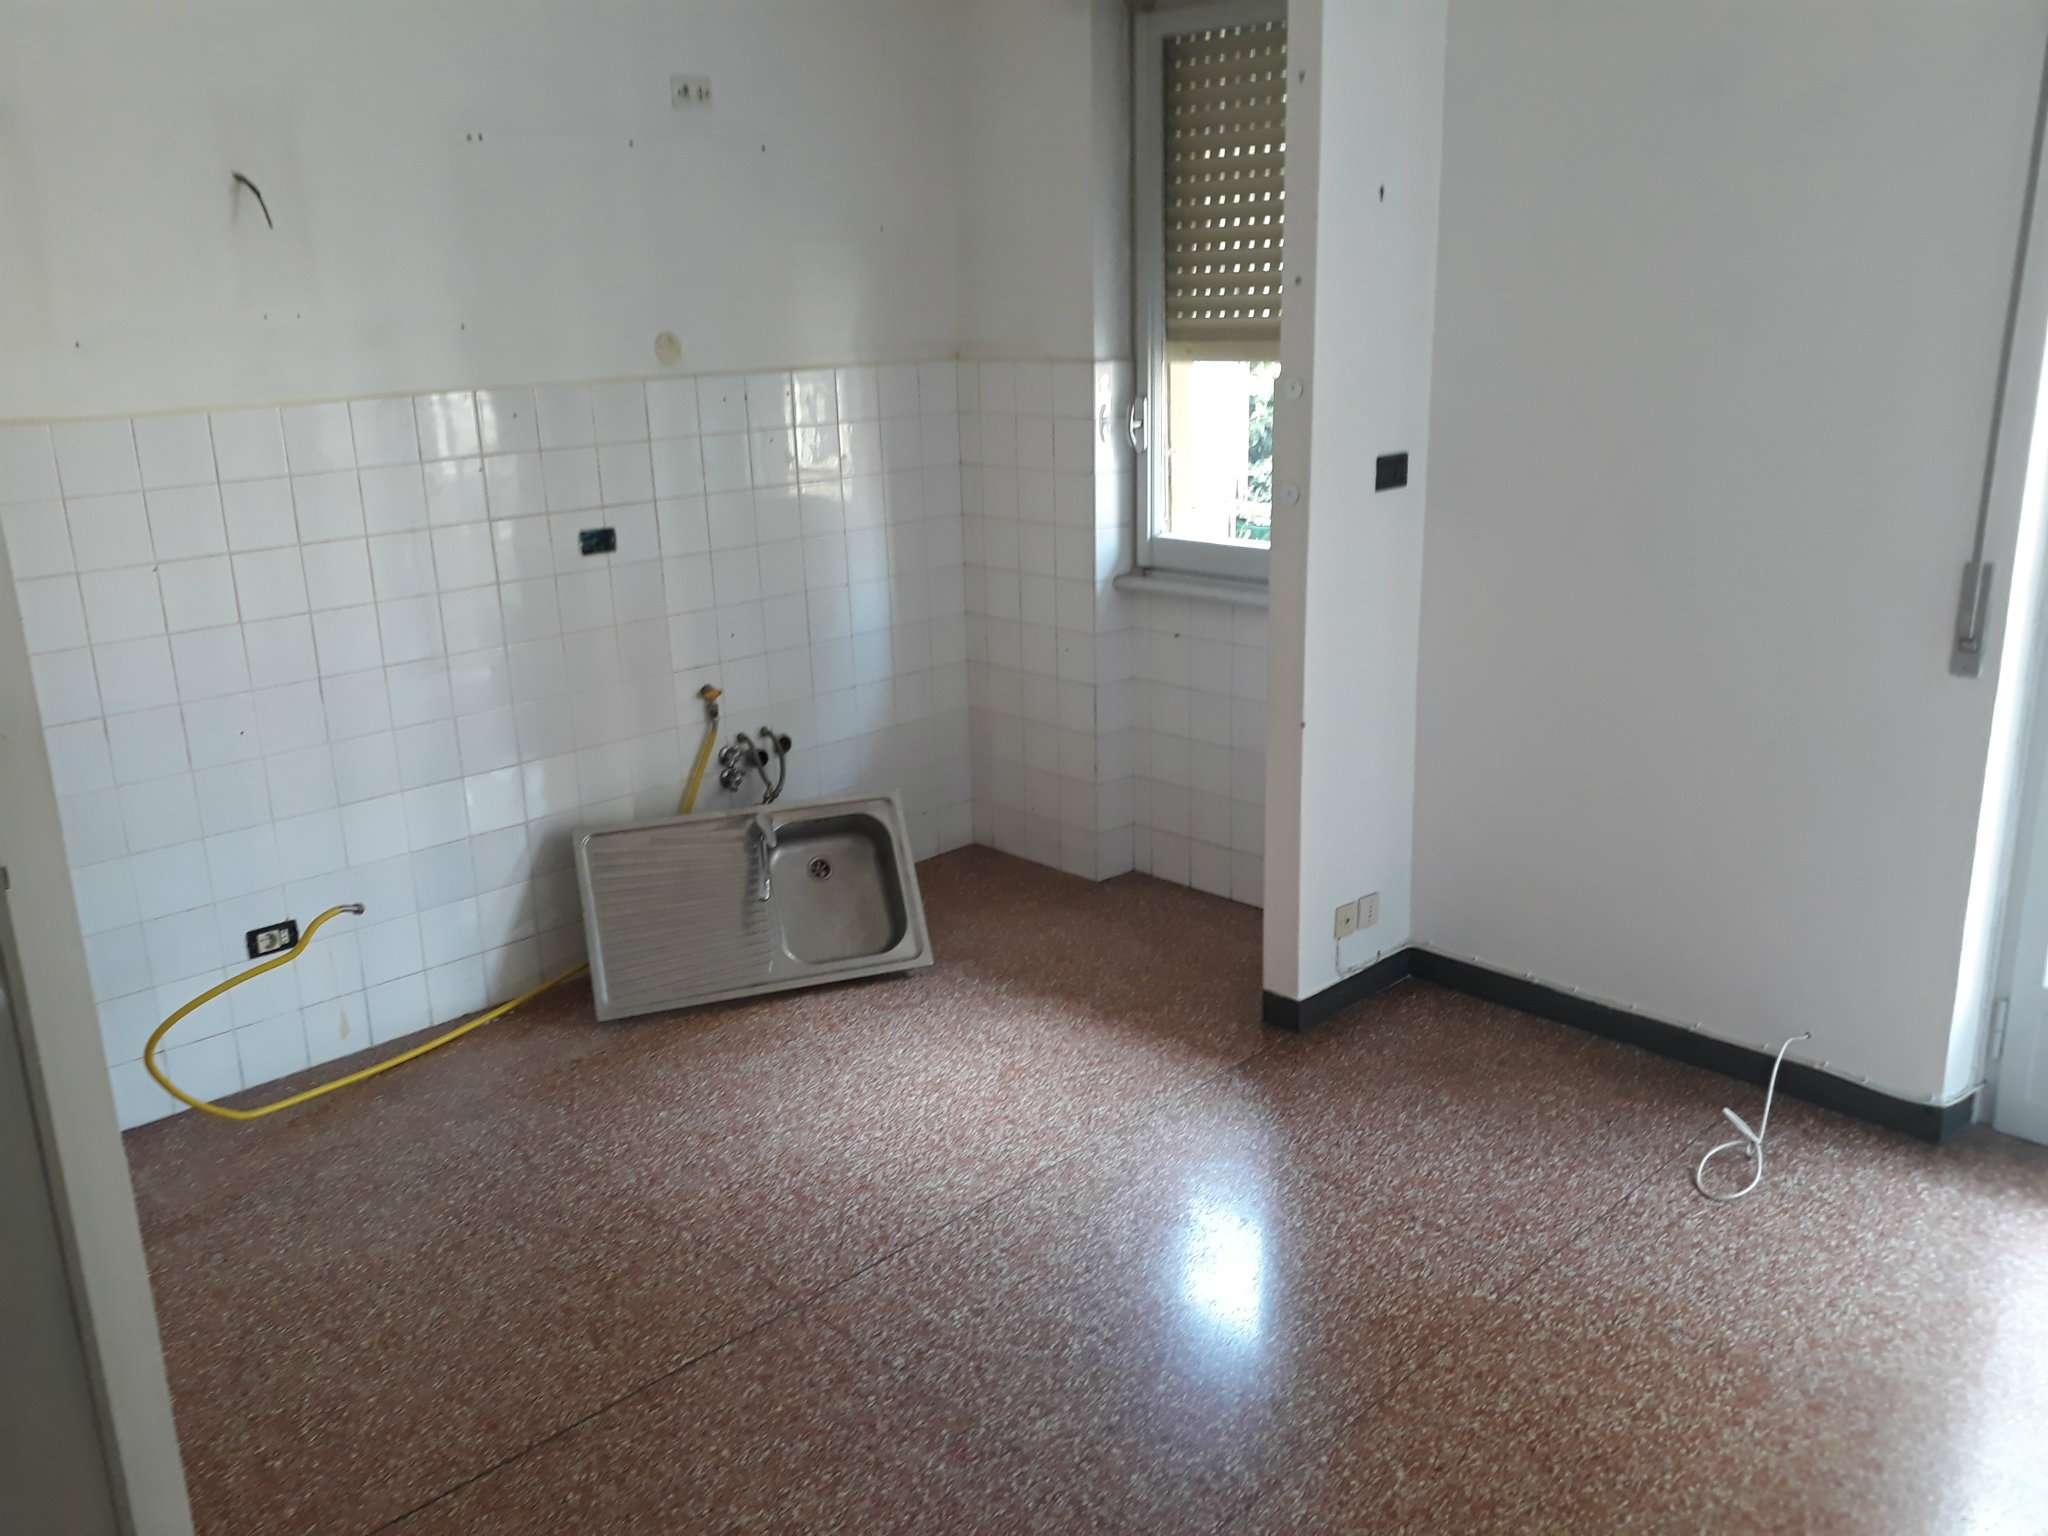 Foto 11 di Bilocale via carrara 128, Genova (zona Boccadasse-Sturla)